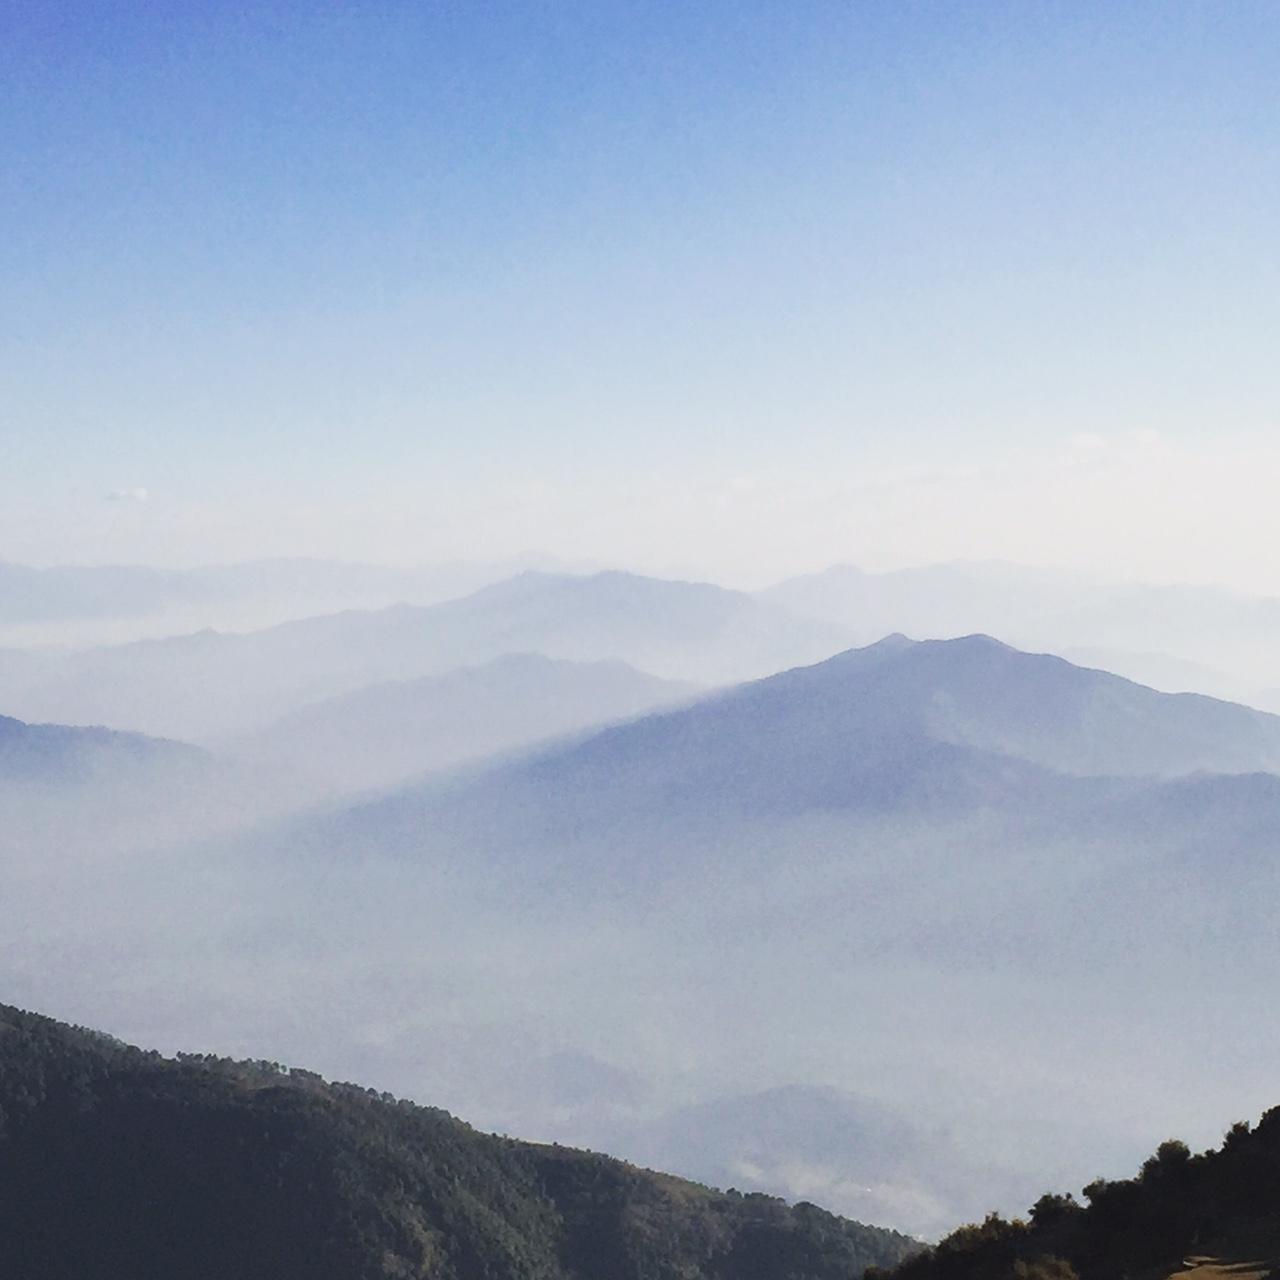 Bir Billing Paragliding site